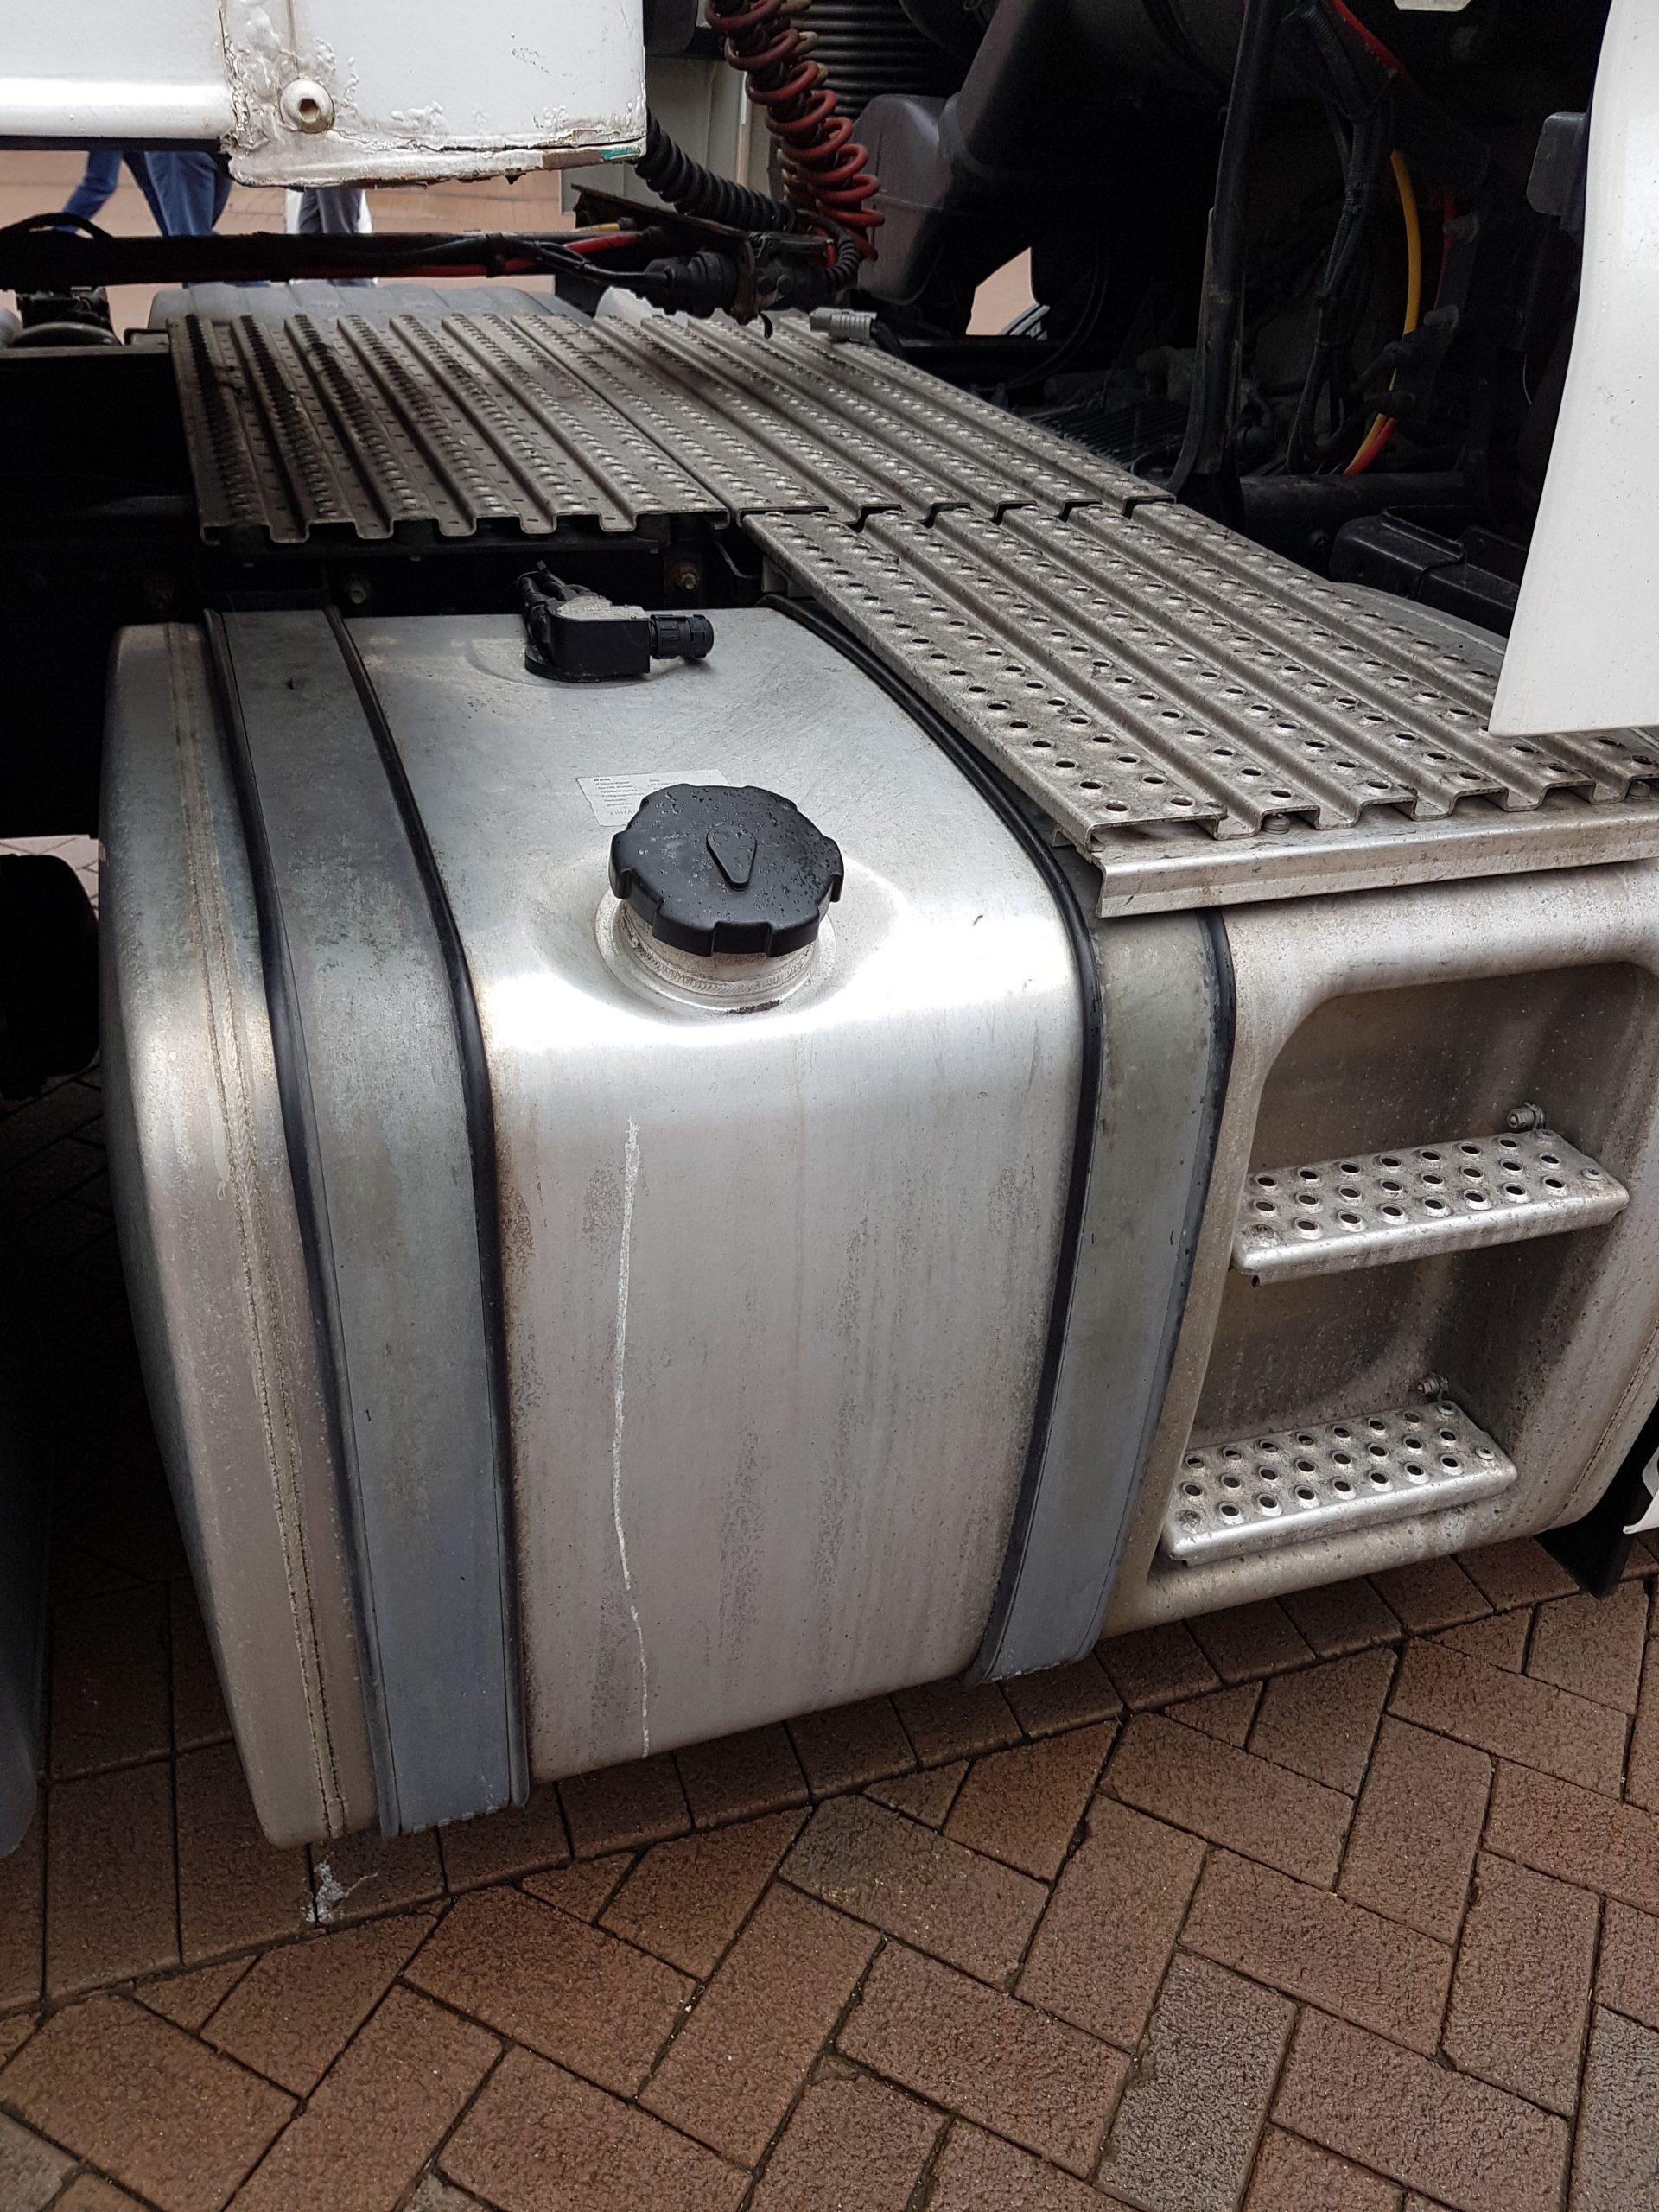 Lorry fuel tank